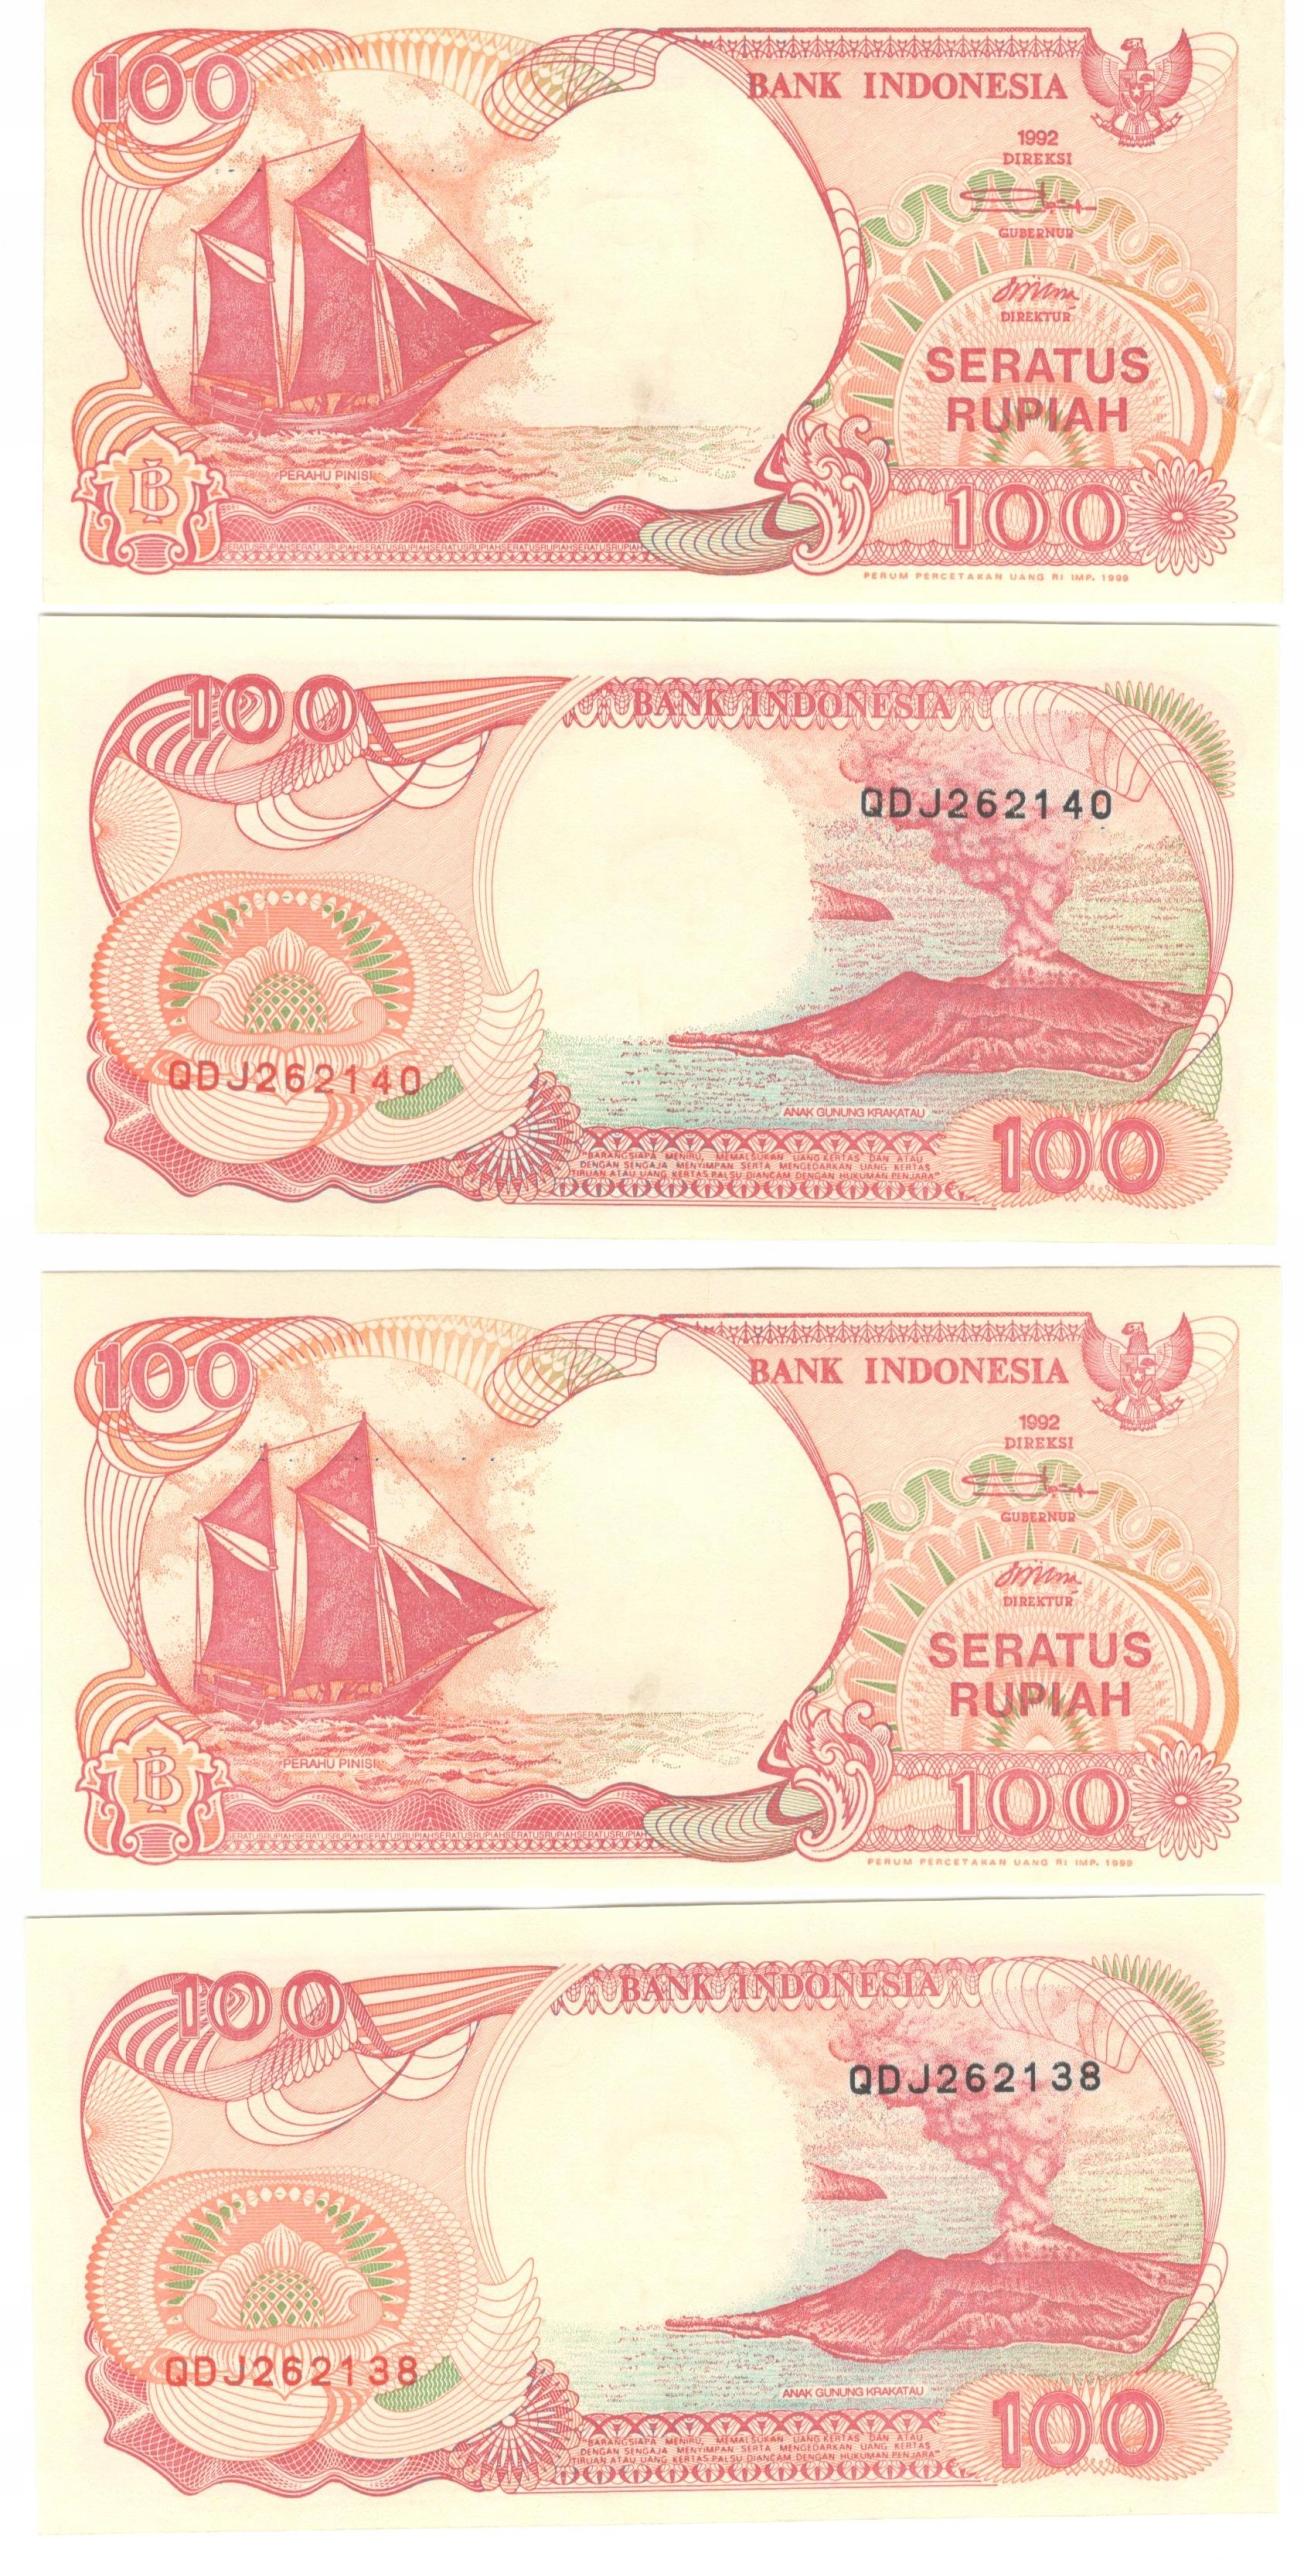 ИНДОНЕЗИЯ - 100 РУП - 1992-1999 гг.